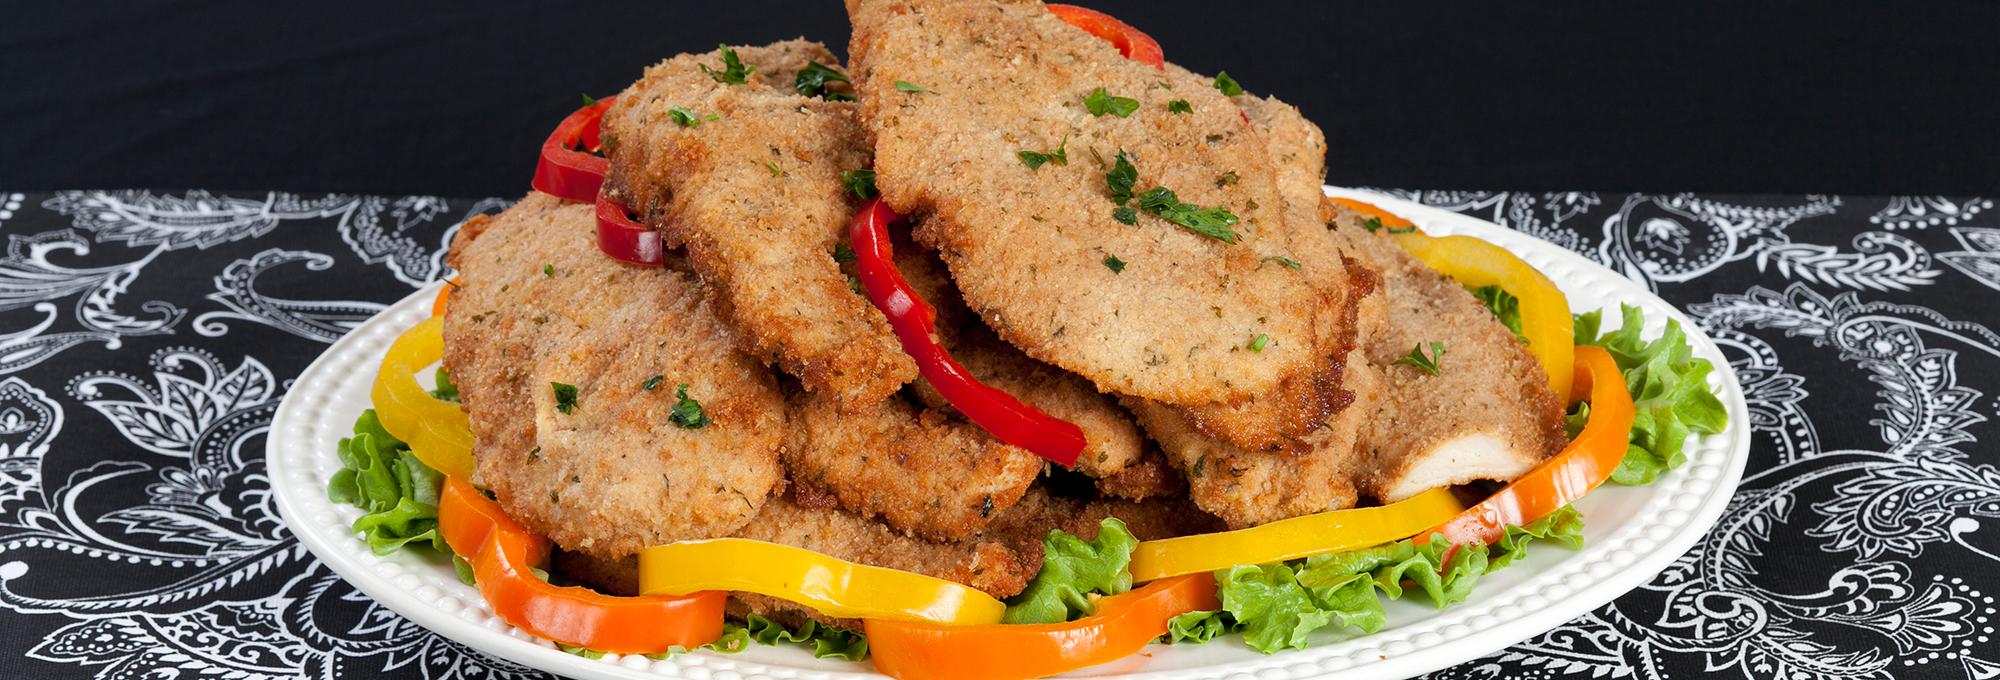 Food Manufacturer | T&L Creative Salads